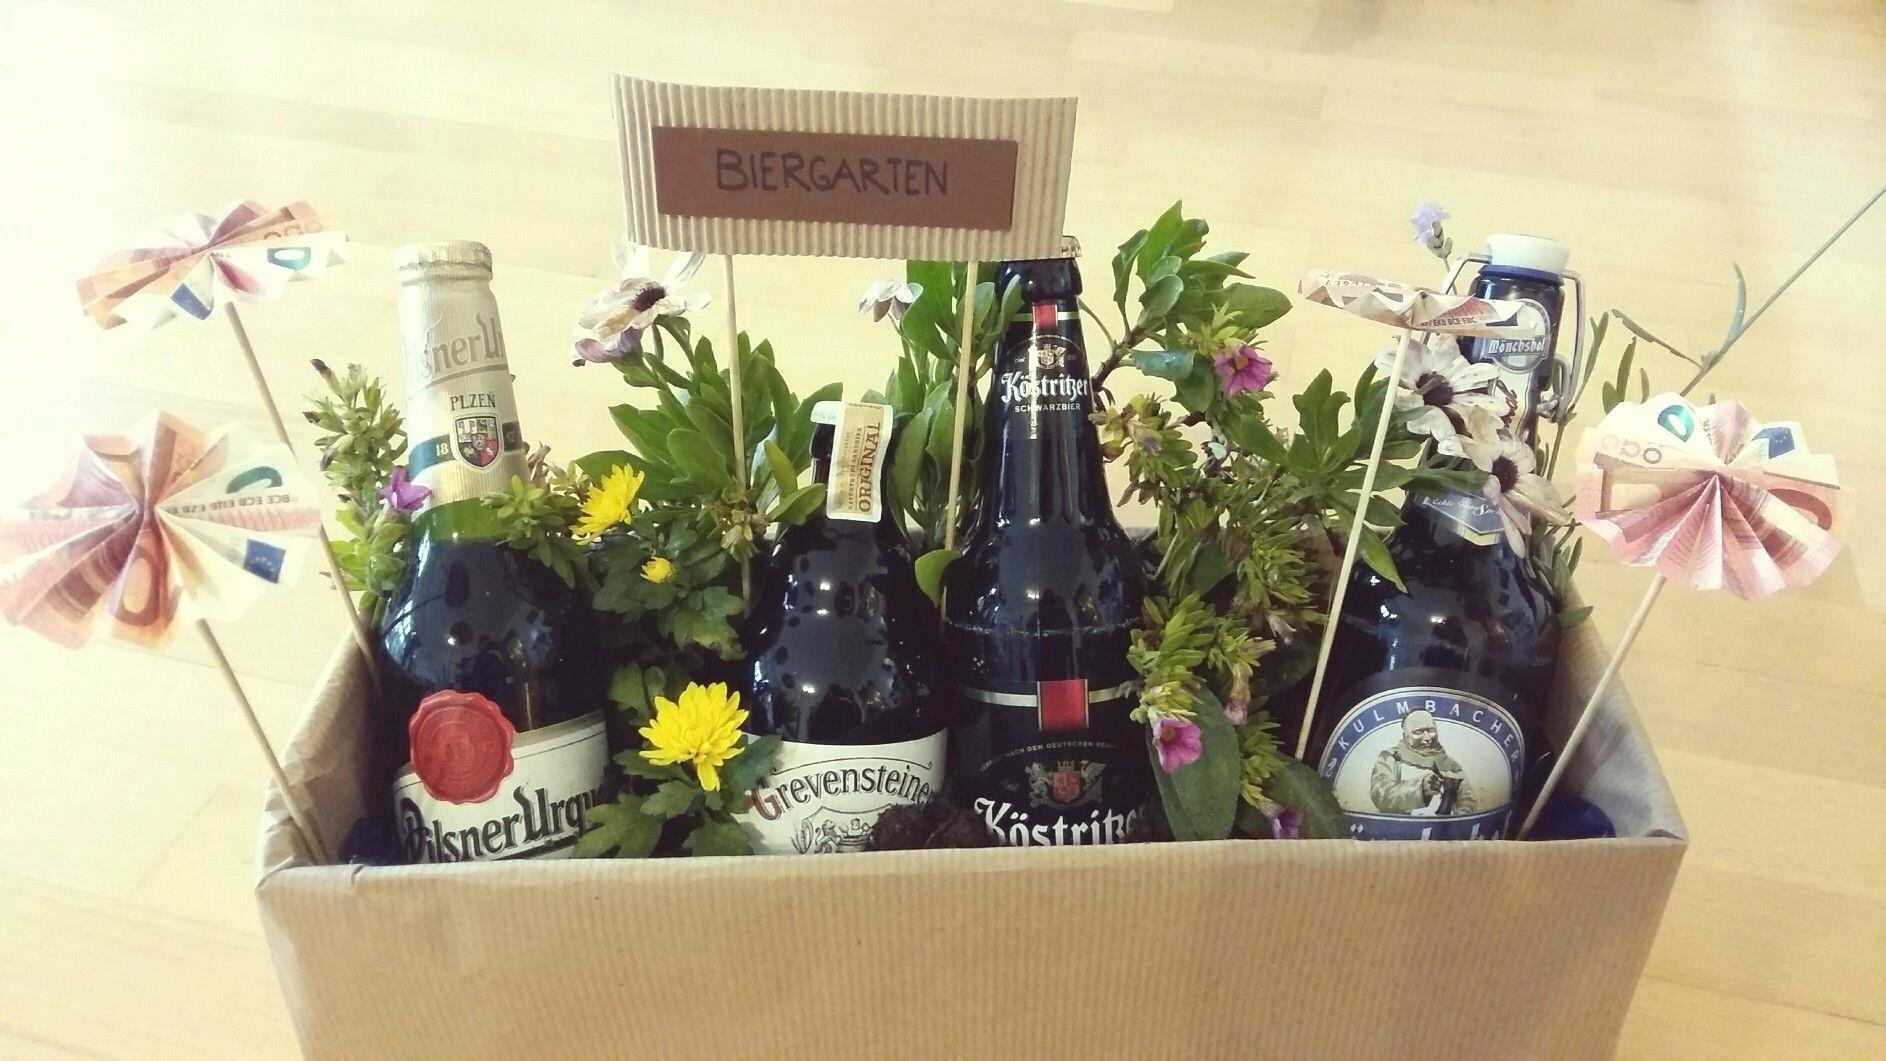 Geburtstagsgeschenk Mann - Biergarten basteln DIY Ideen